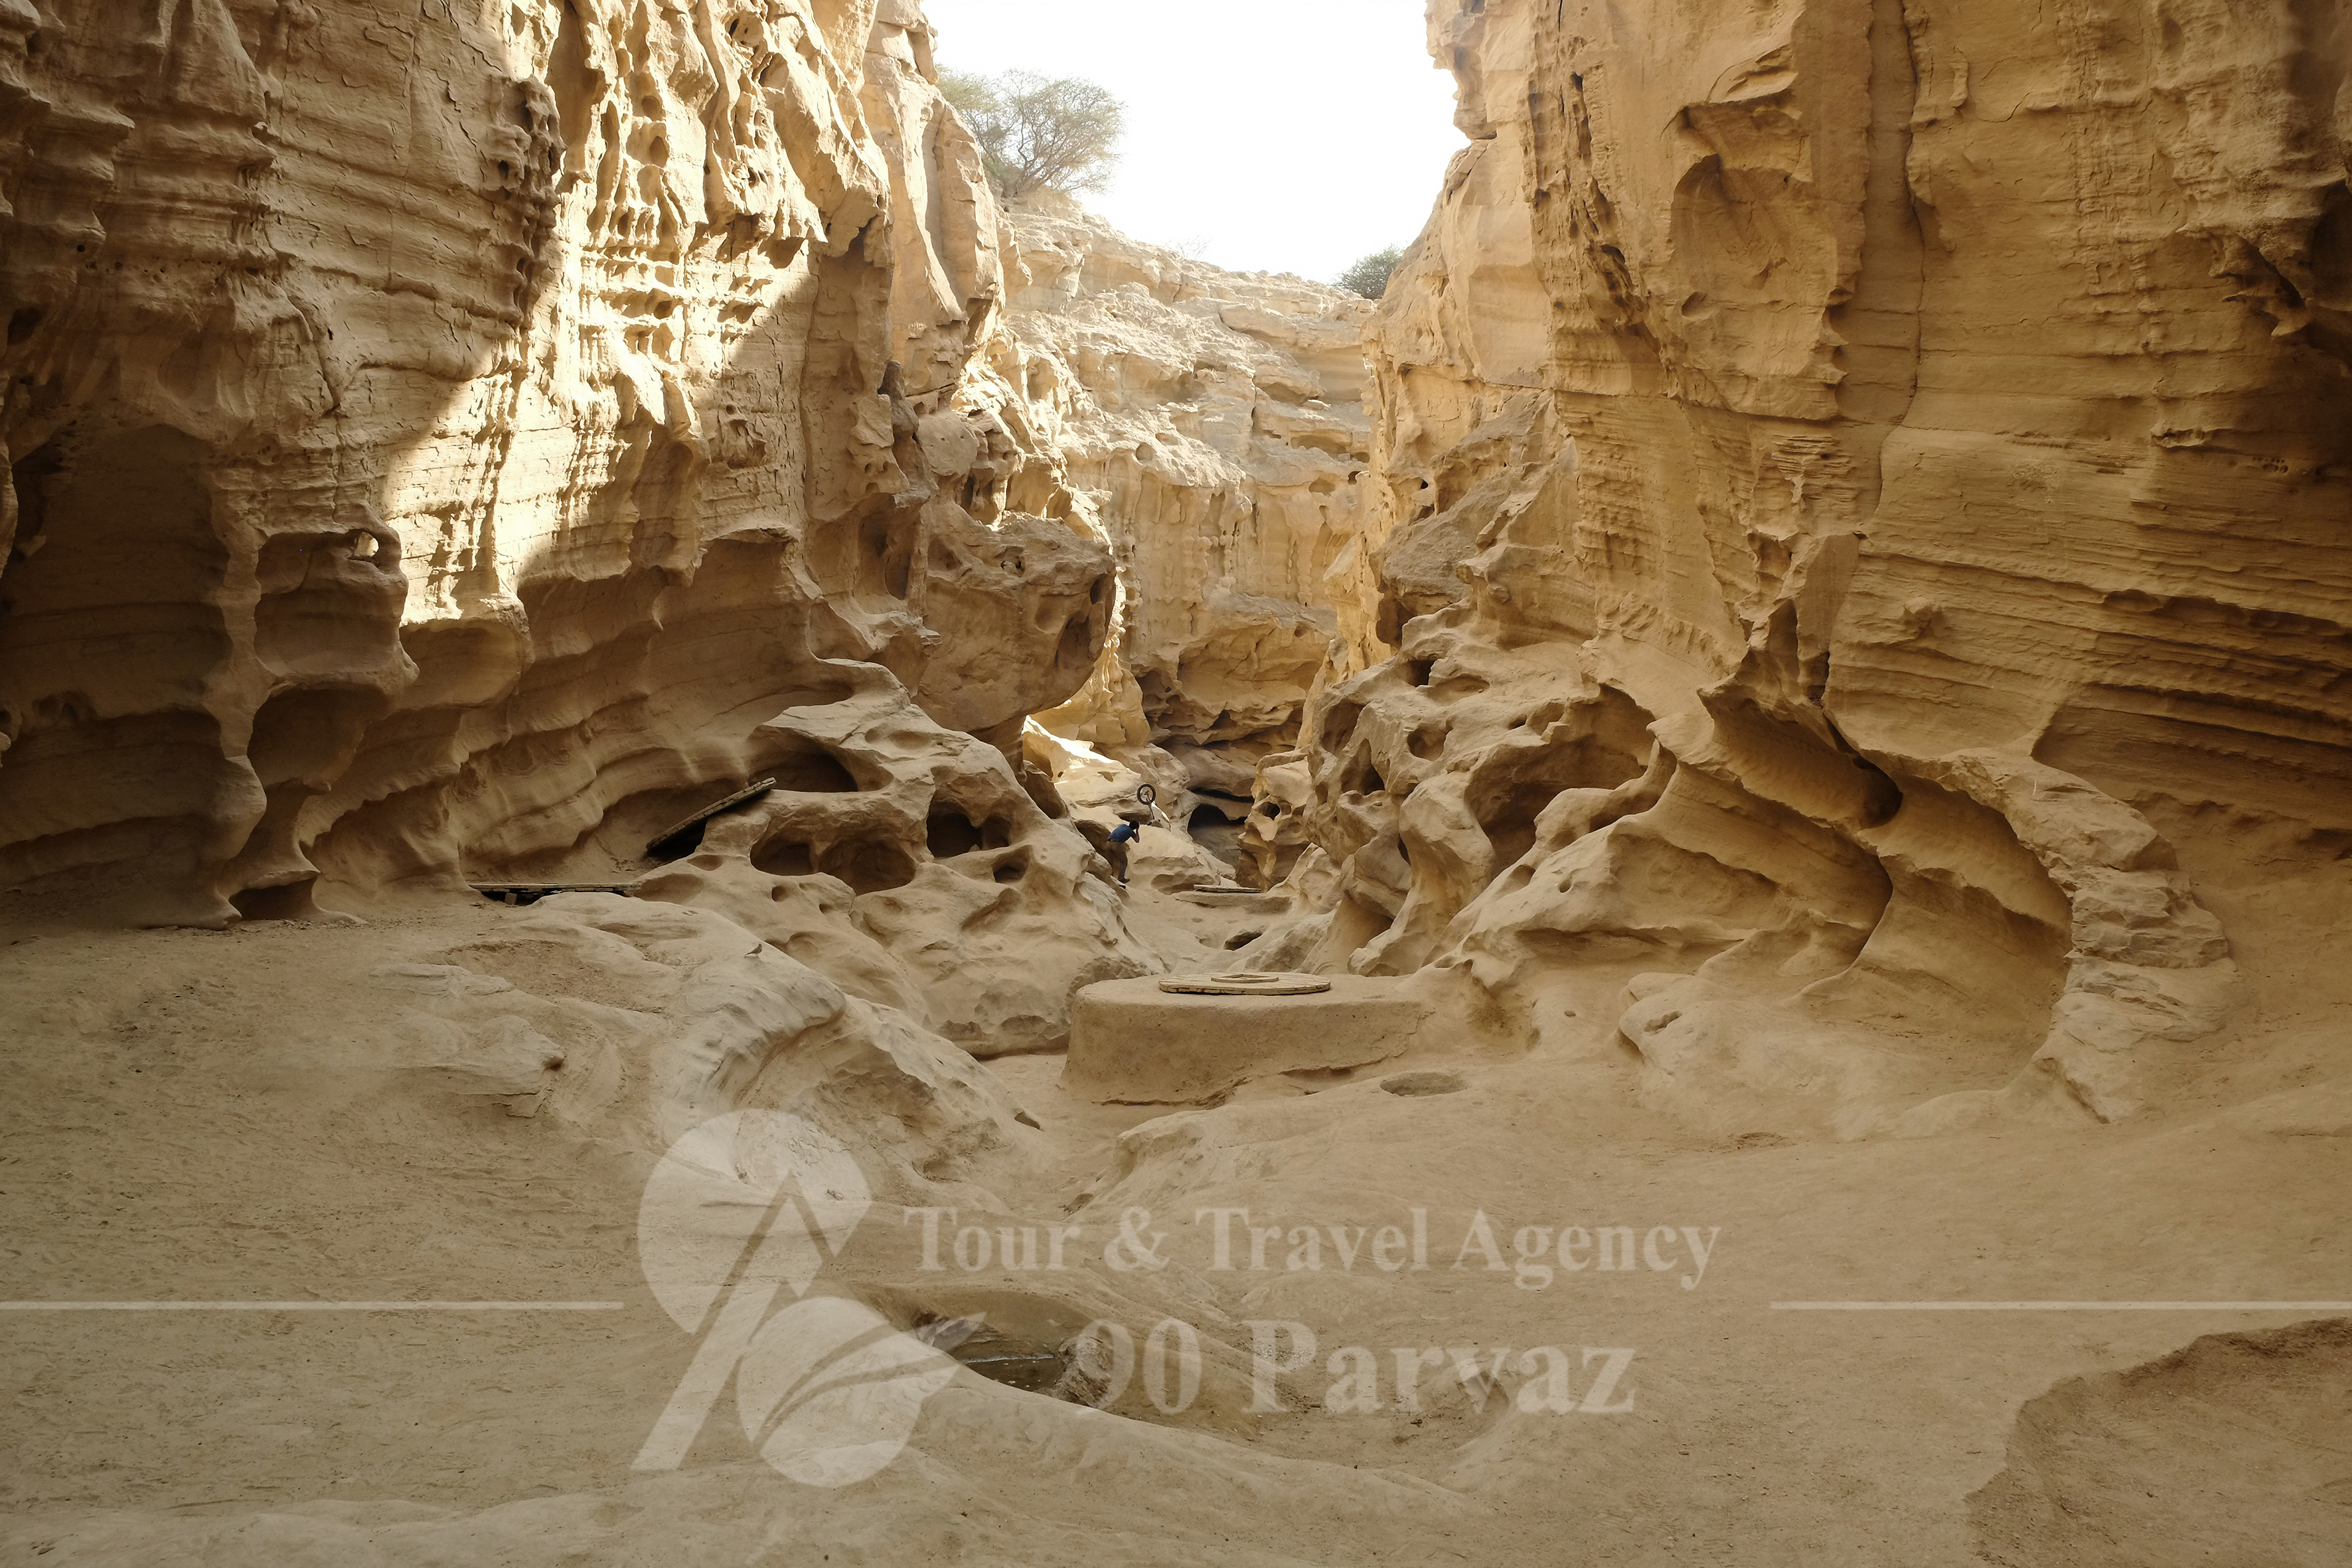 Iran attractions Qeshm Chahkooh Canyon (1)